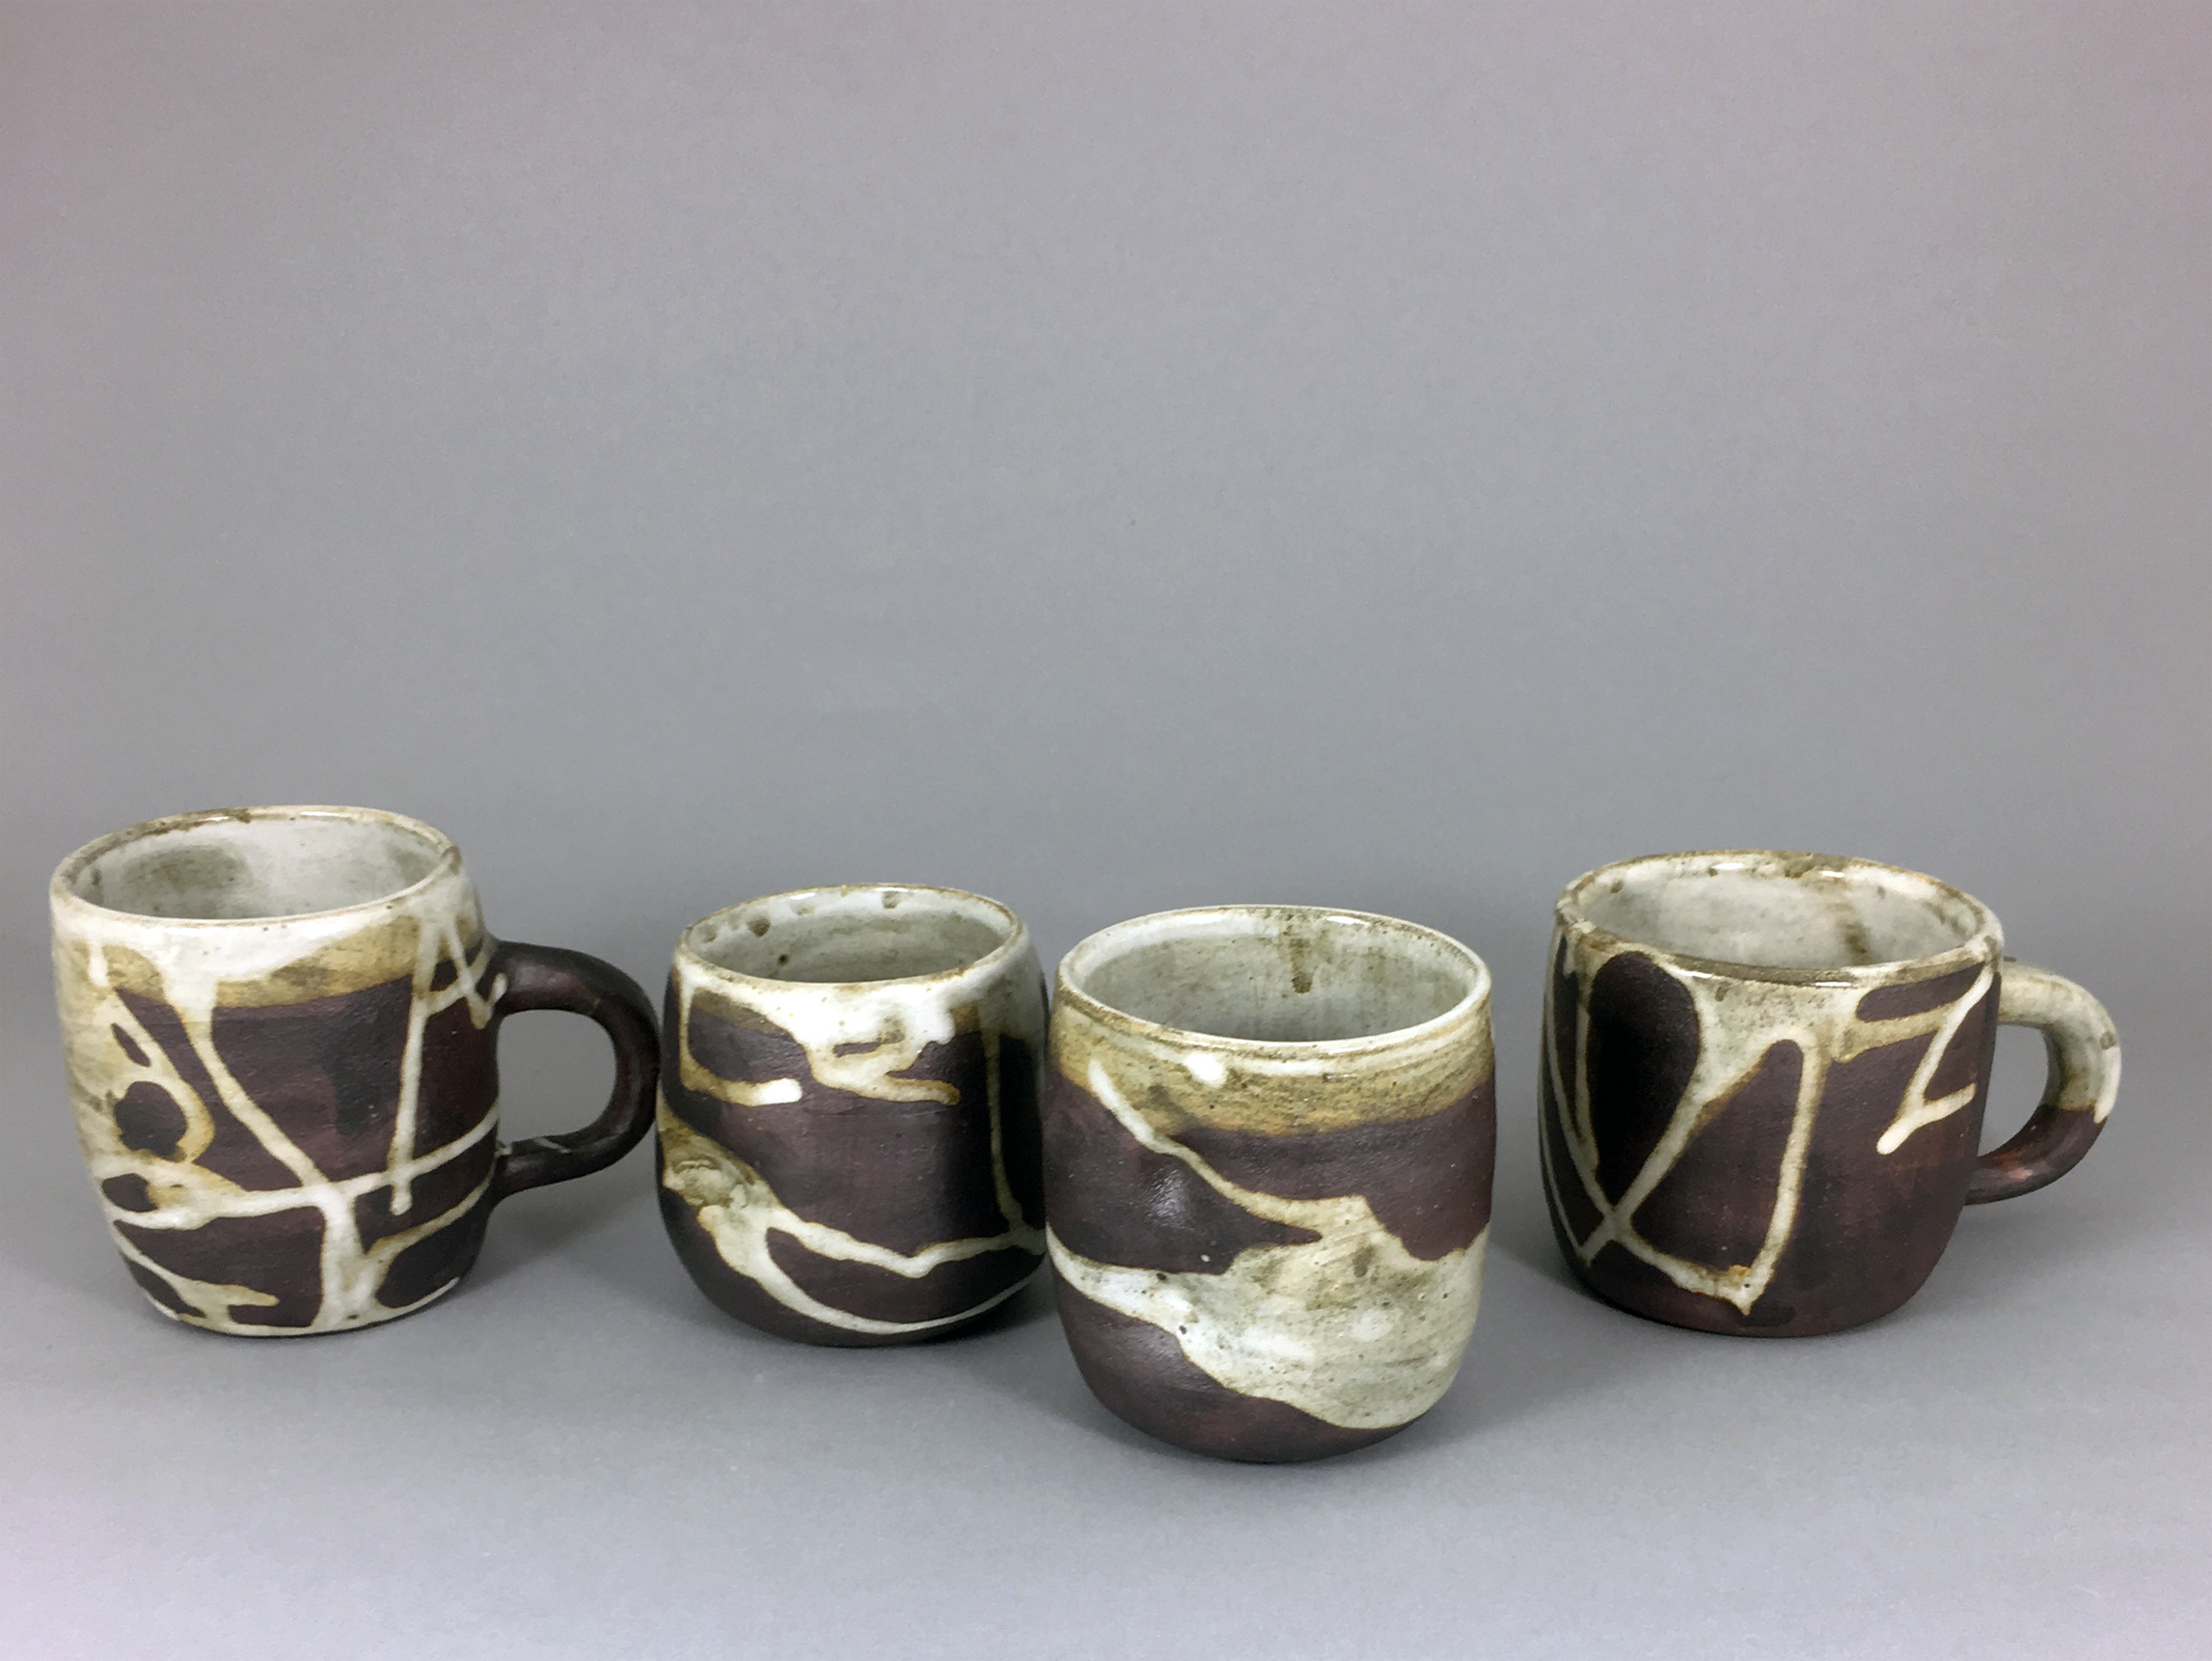 canyon mugs and thumb tumblers